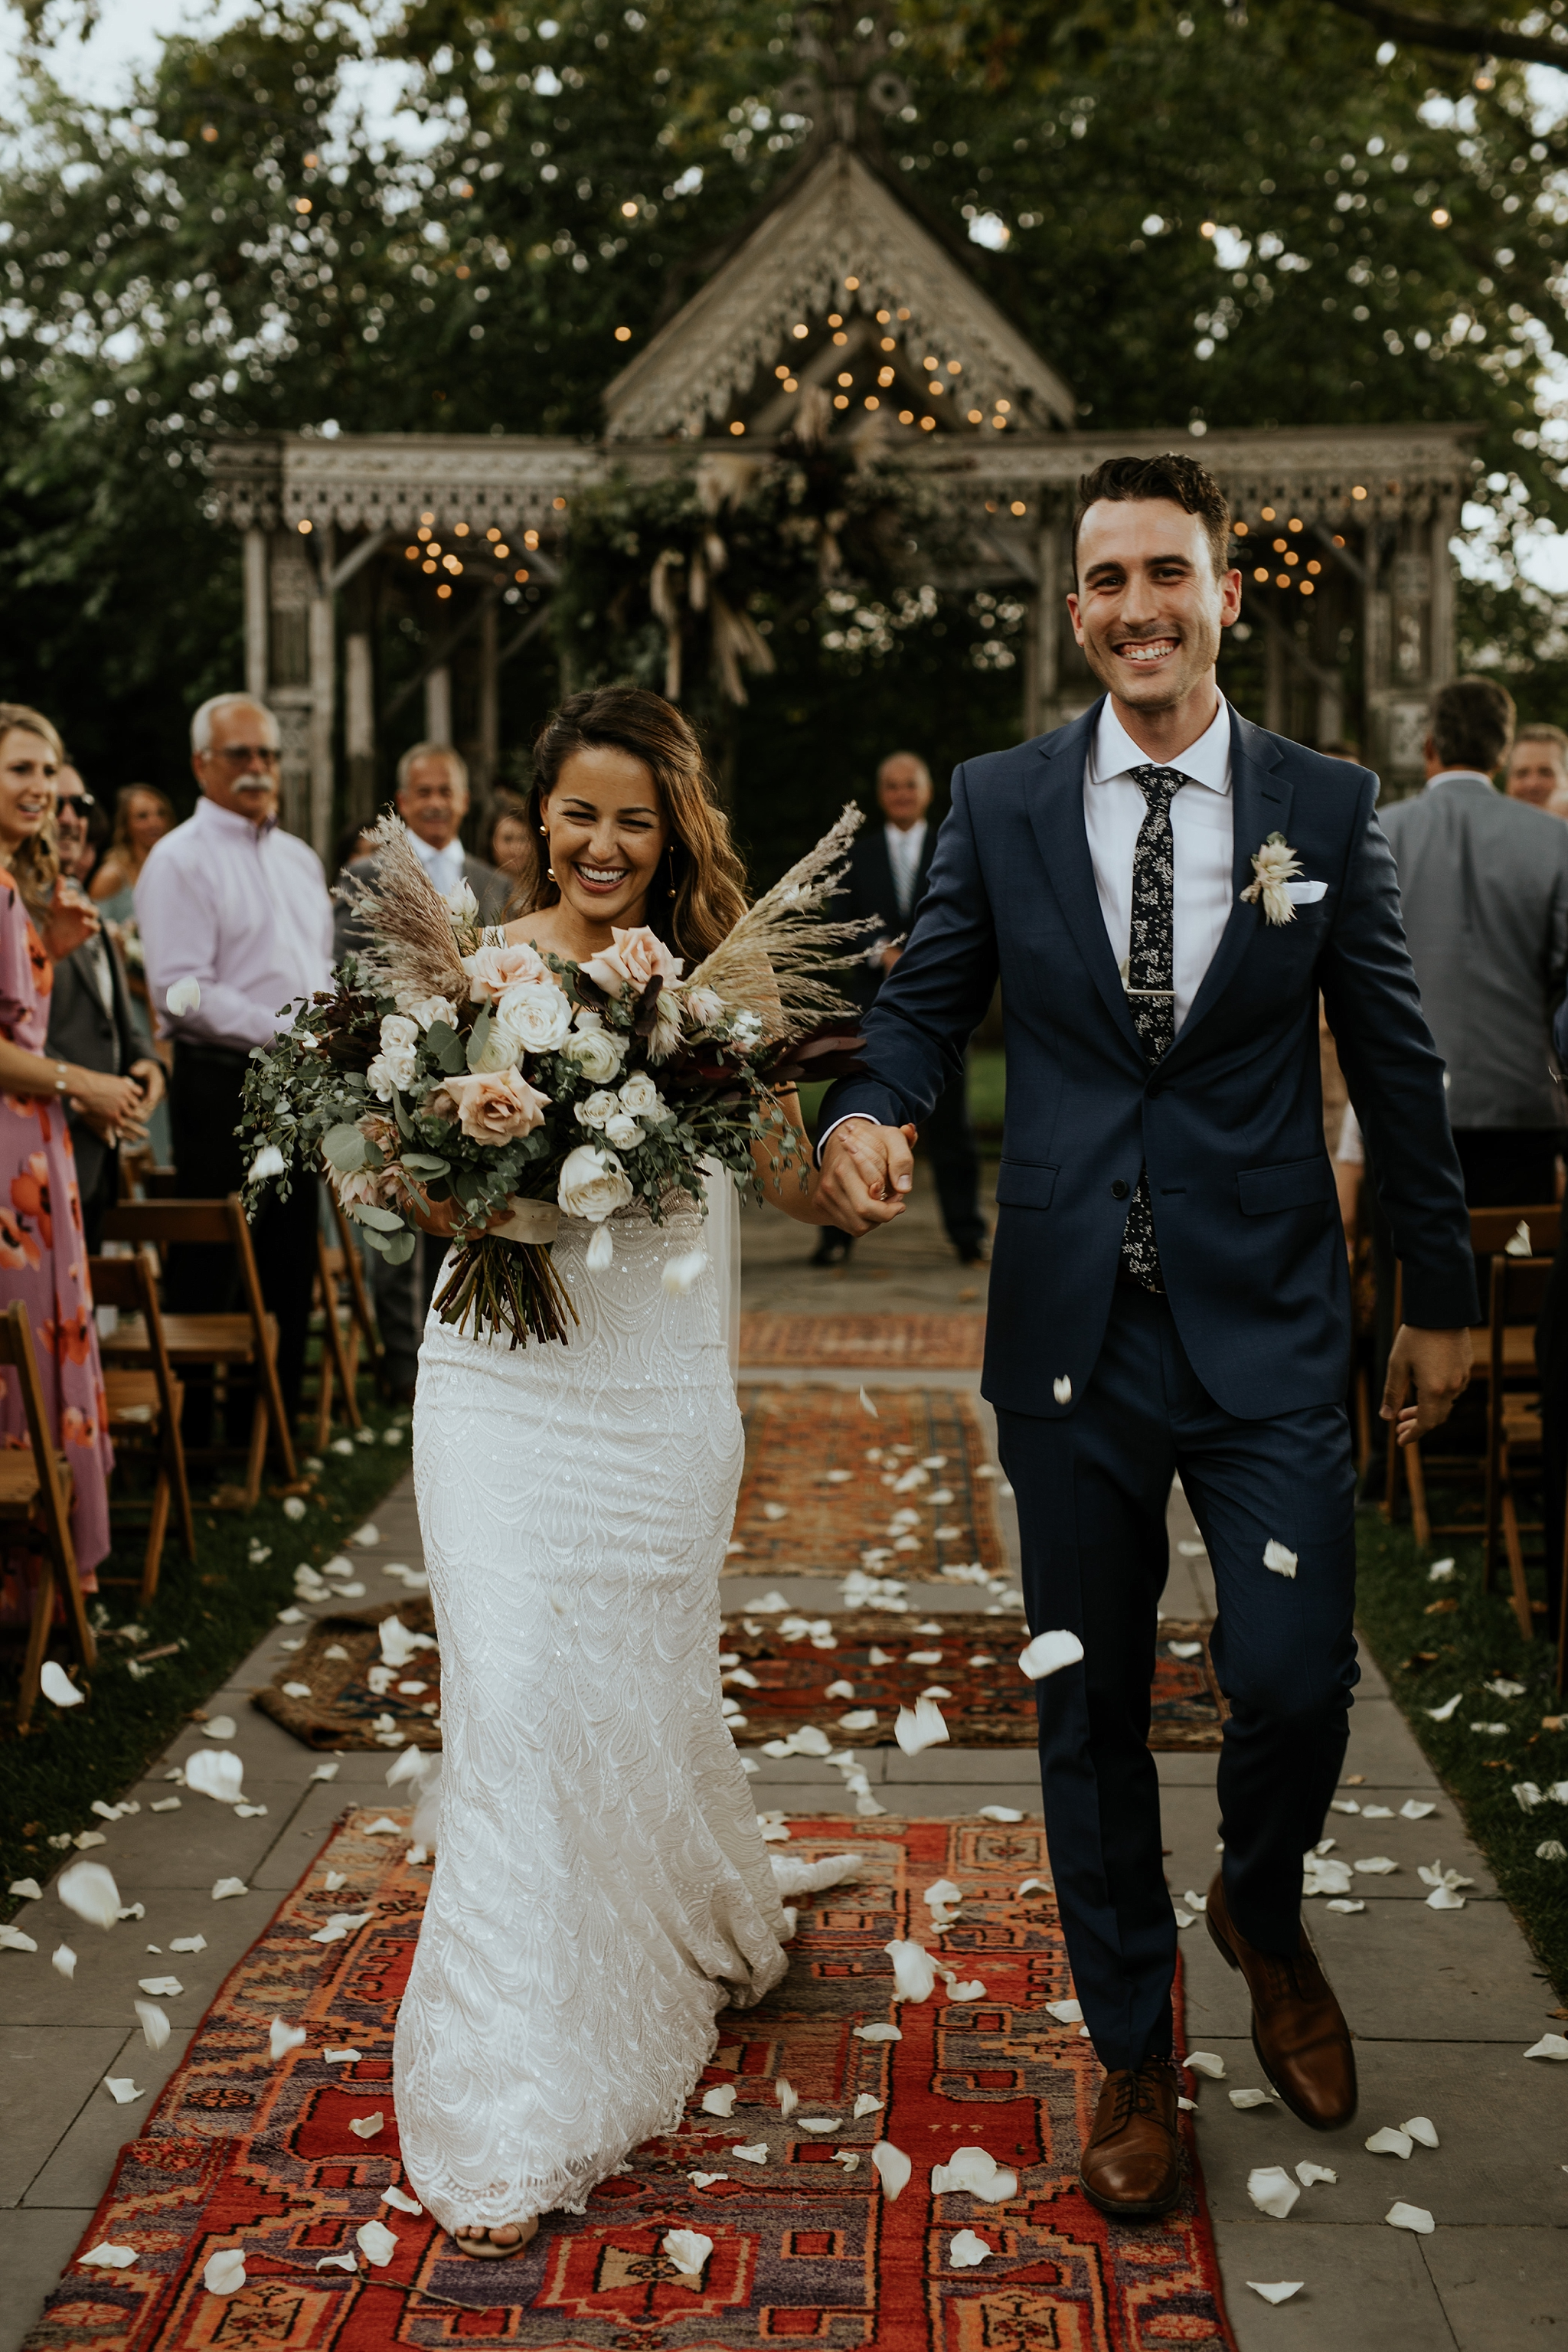 Heartfelt Botanical Terrain at Styers Wedding in Glenn Mills Pennslyvania by Trin Jensen Photography_0031.jpg